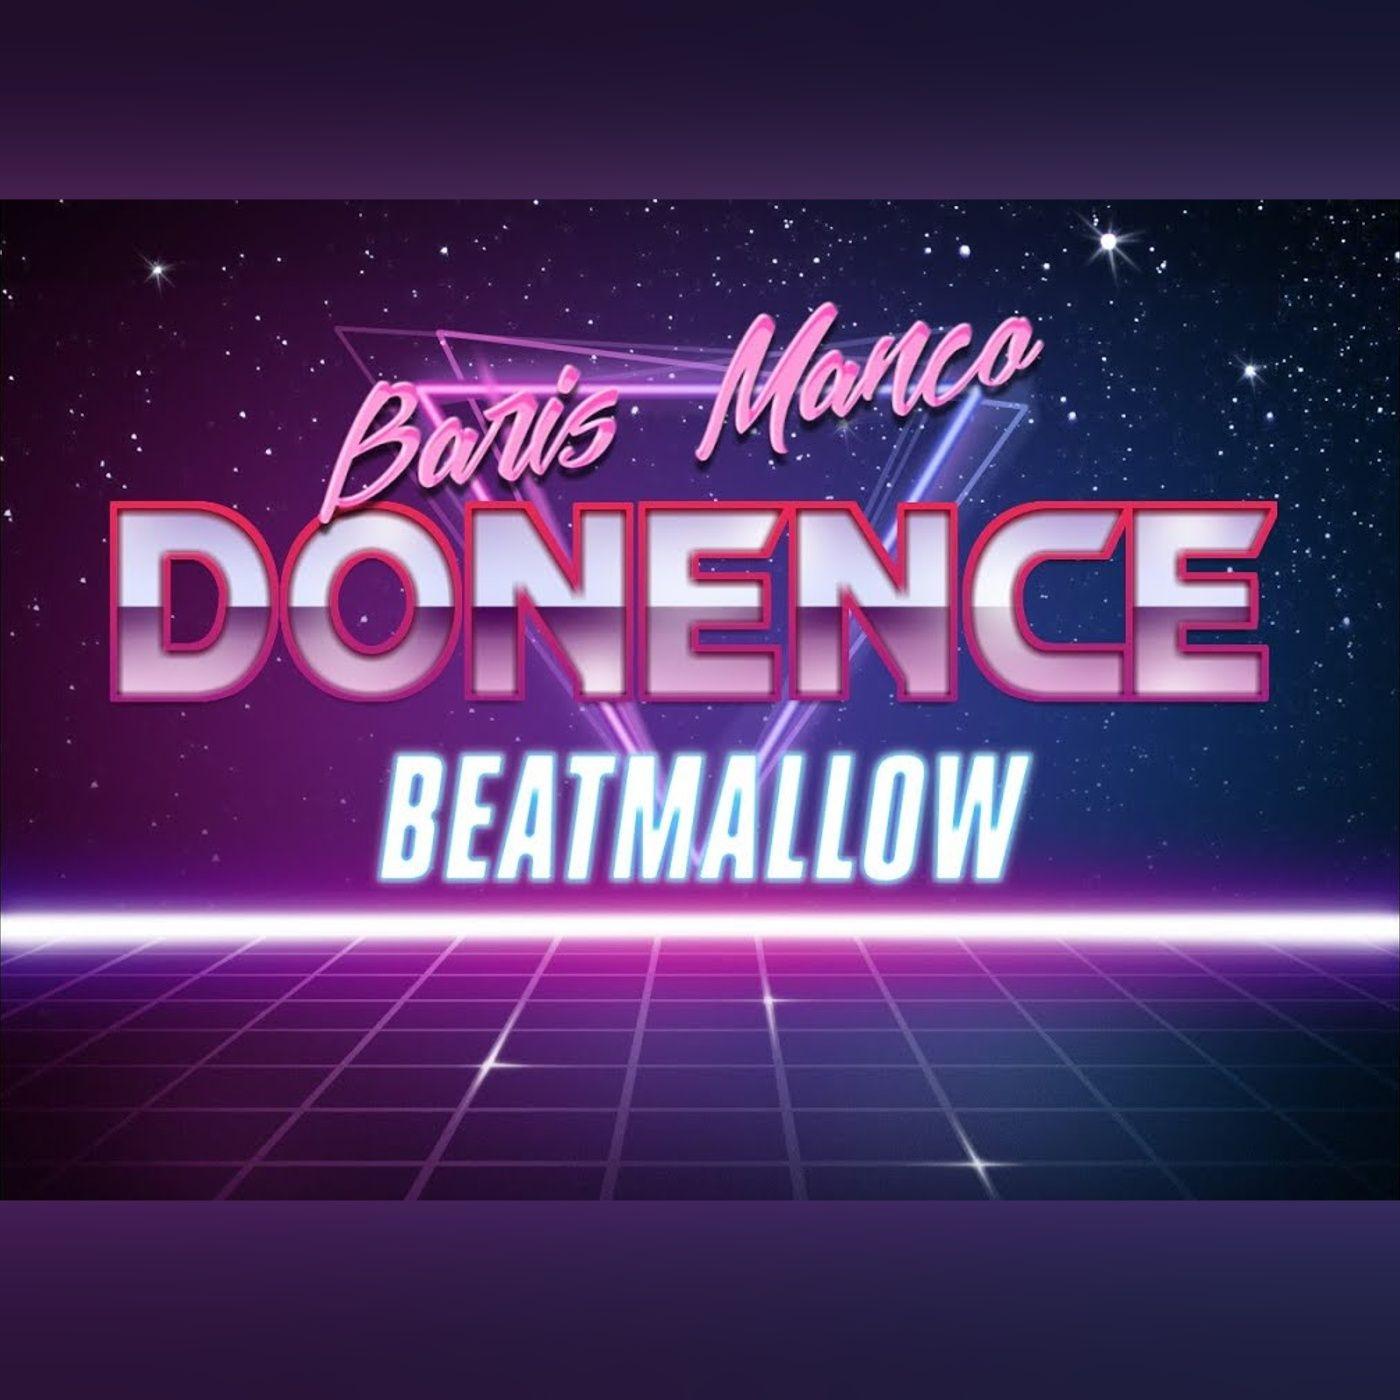 Barış Manço - Dönence 80s (RetroWave) Re-edit (Beatmallow)